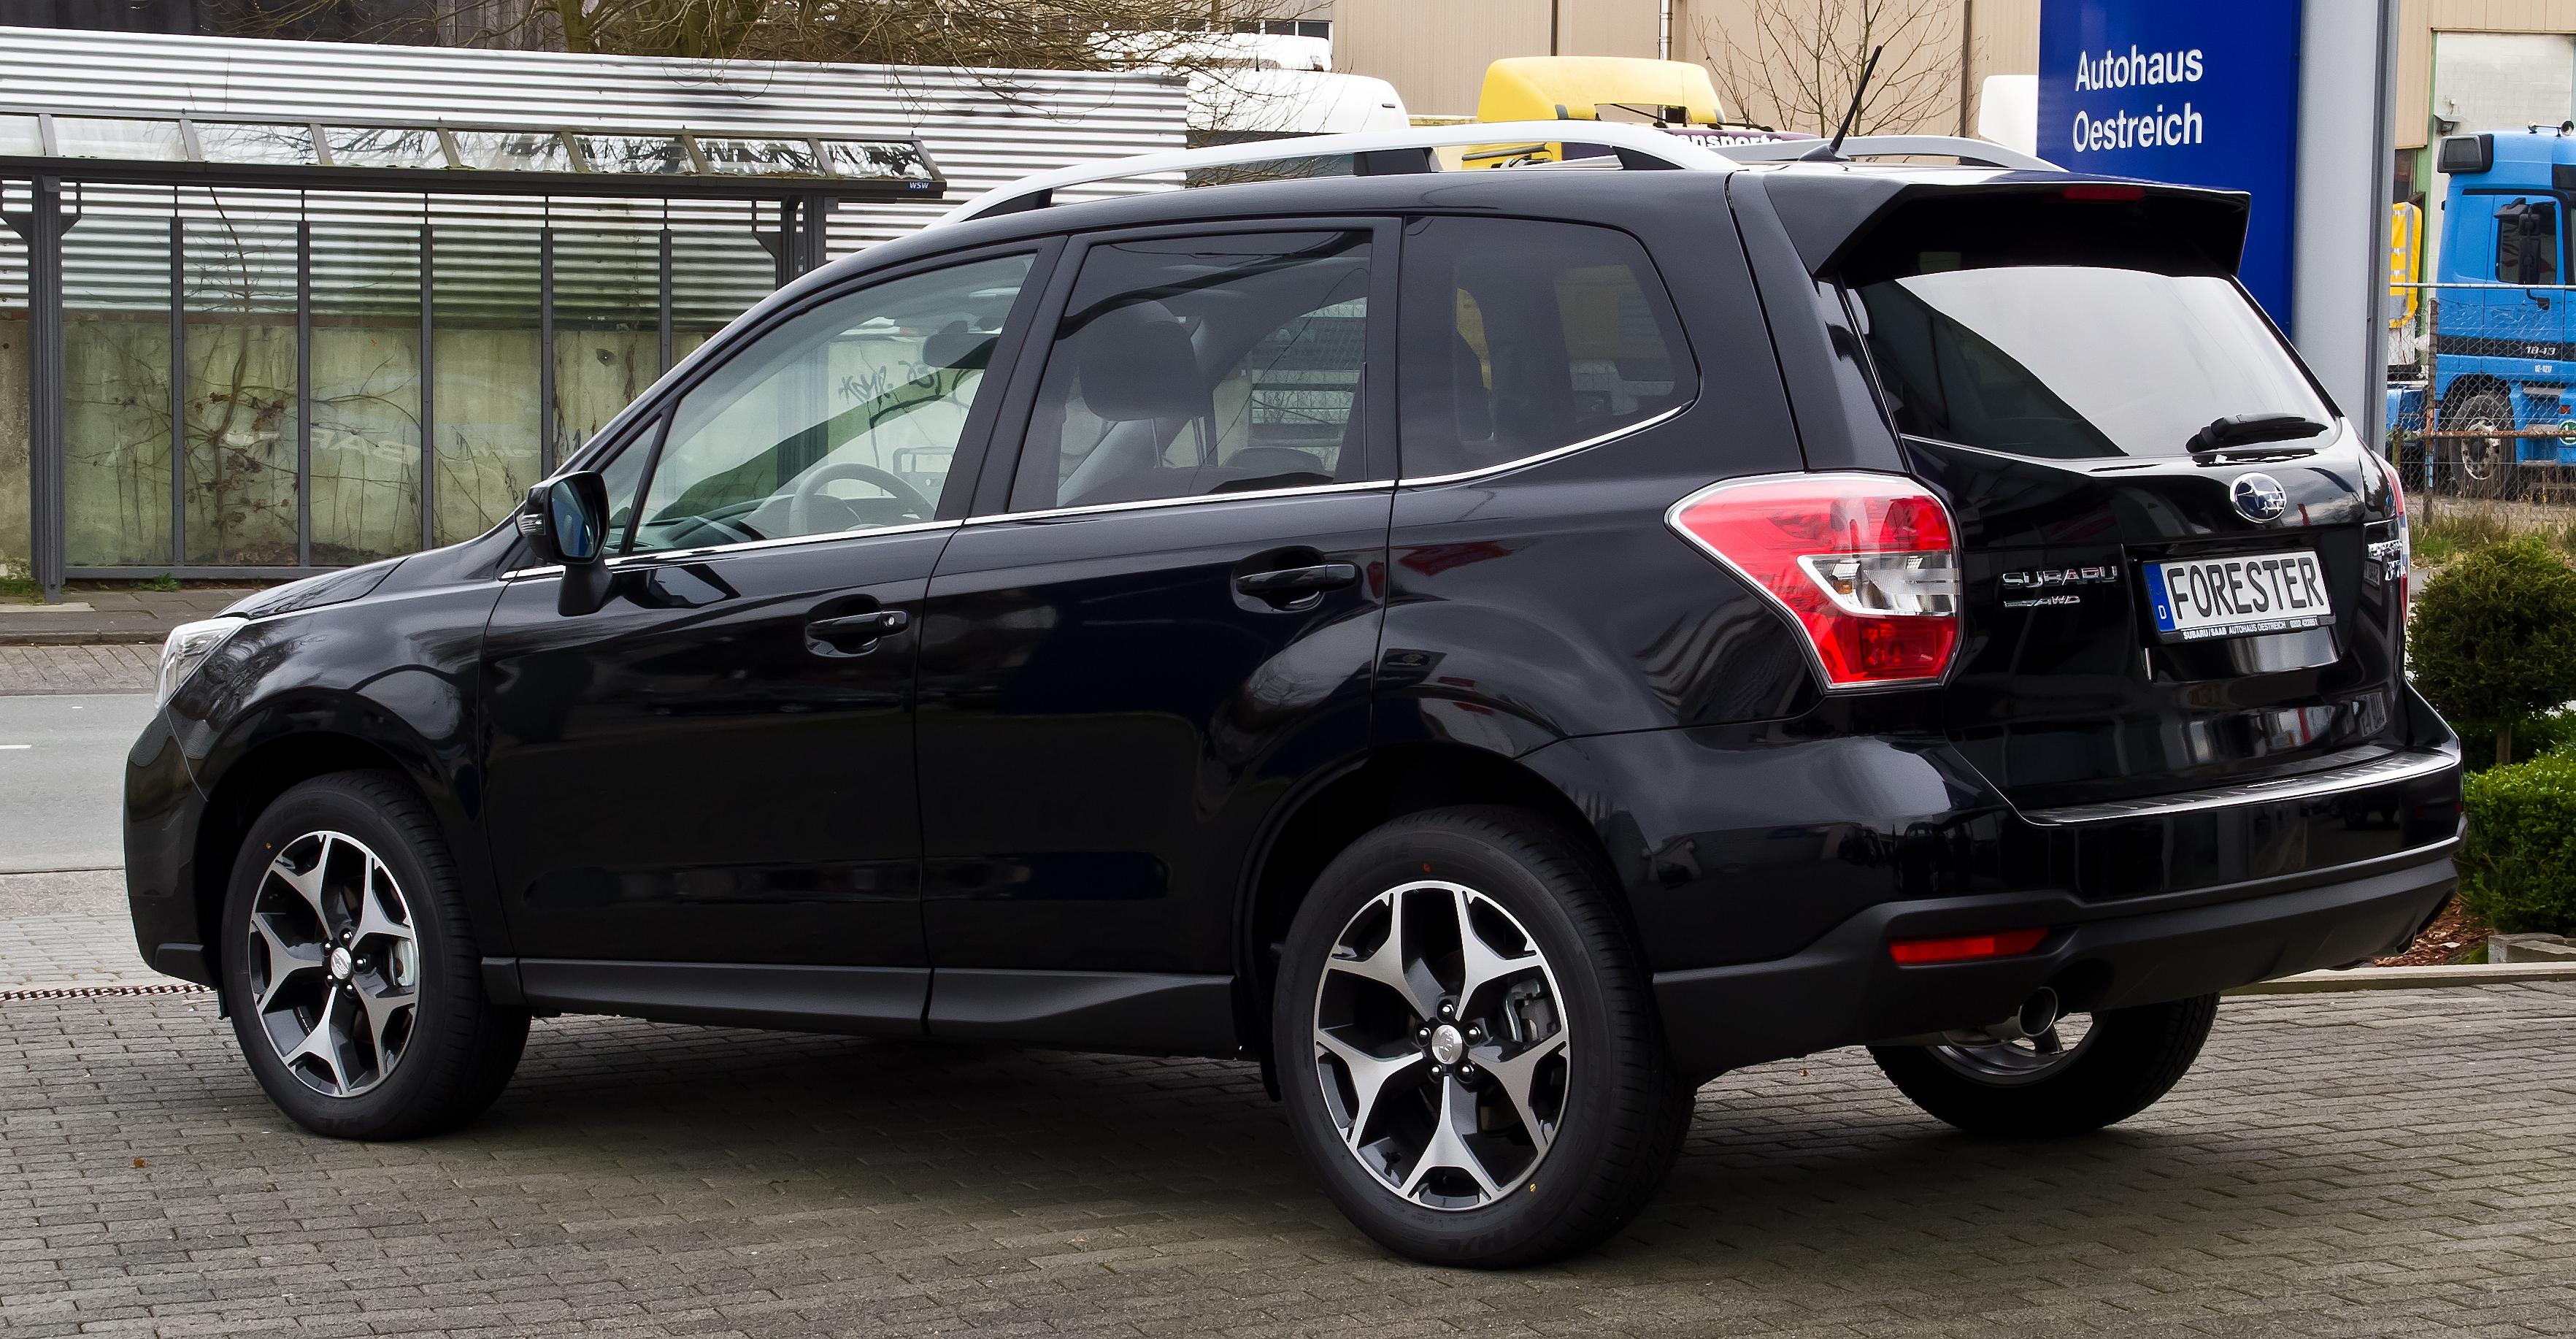 File:Subaru Forester 2.0XT AWD Platinum (IV) – Heckansicht, 1. März ...